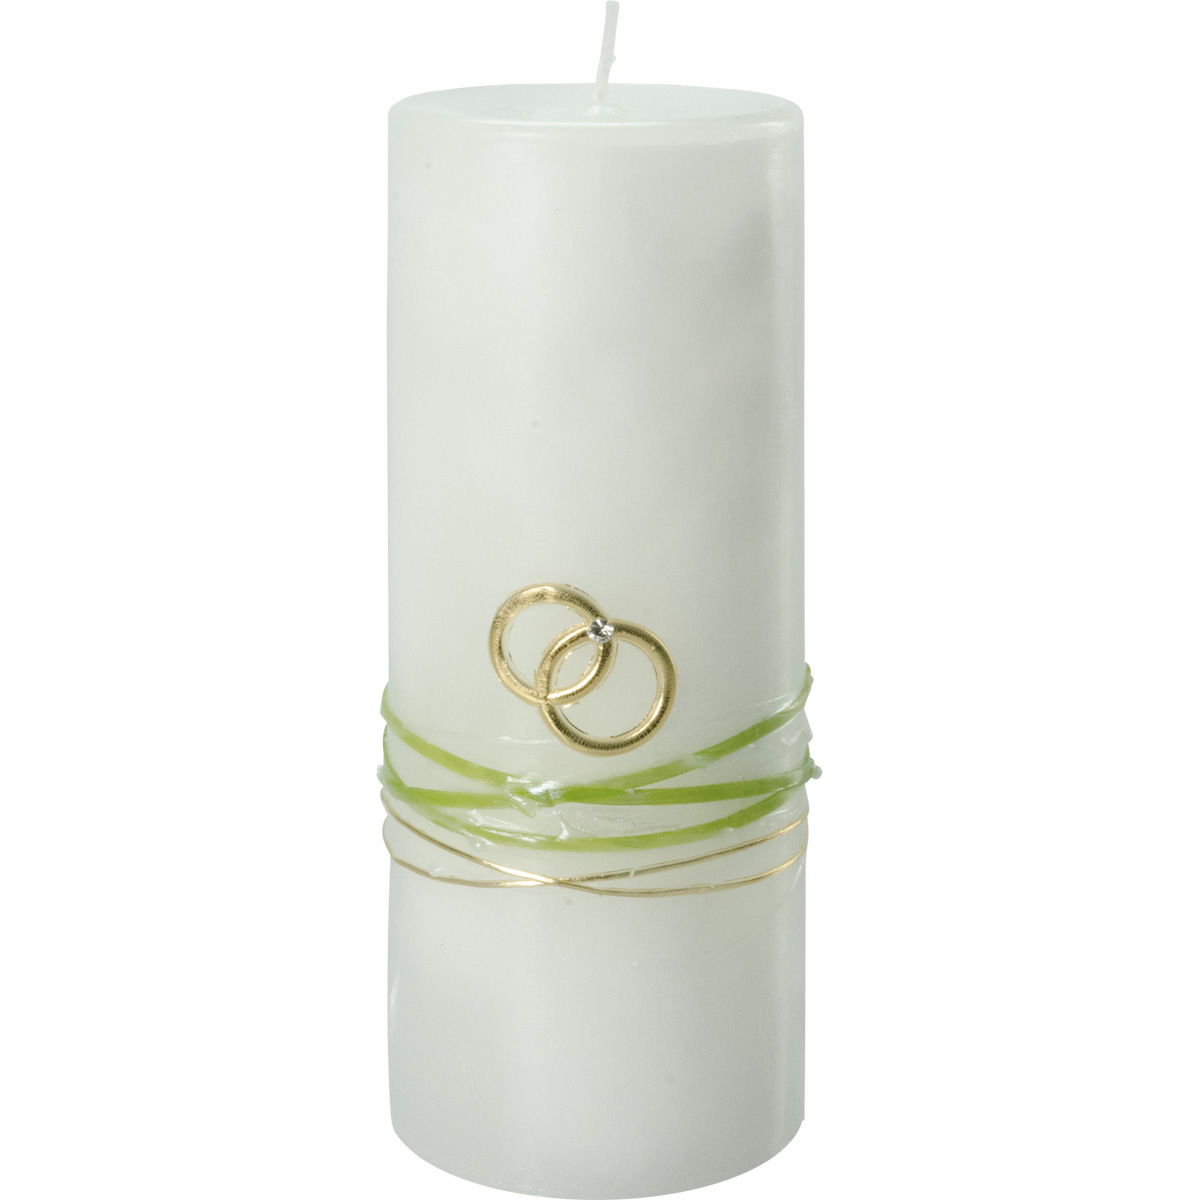 Hochzeitskerze, #2265, Trendkerze 180x70, Ringe, Straßst., grün, gold